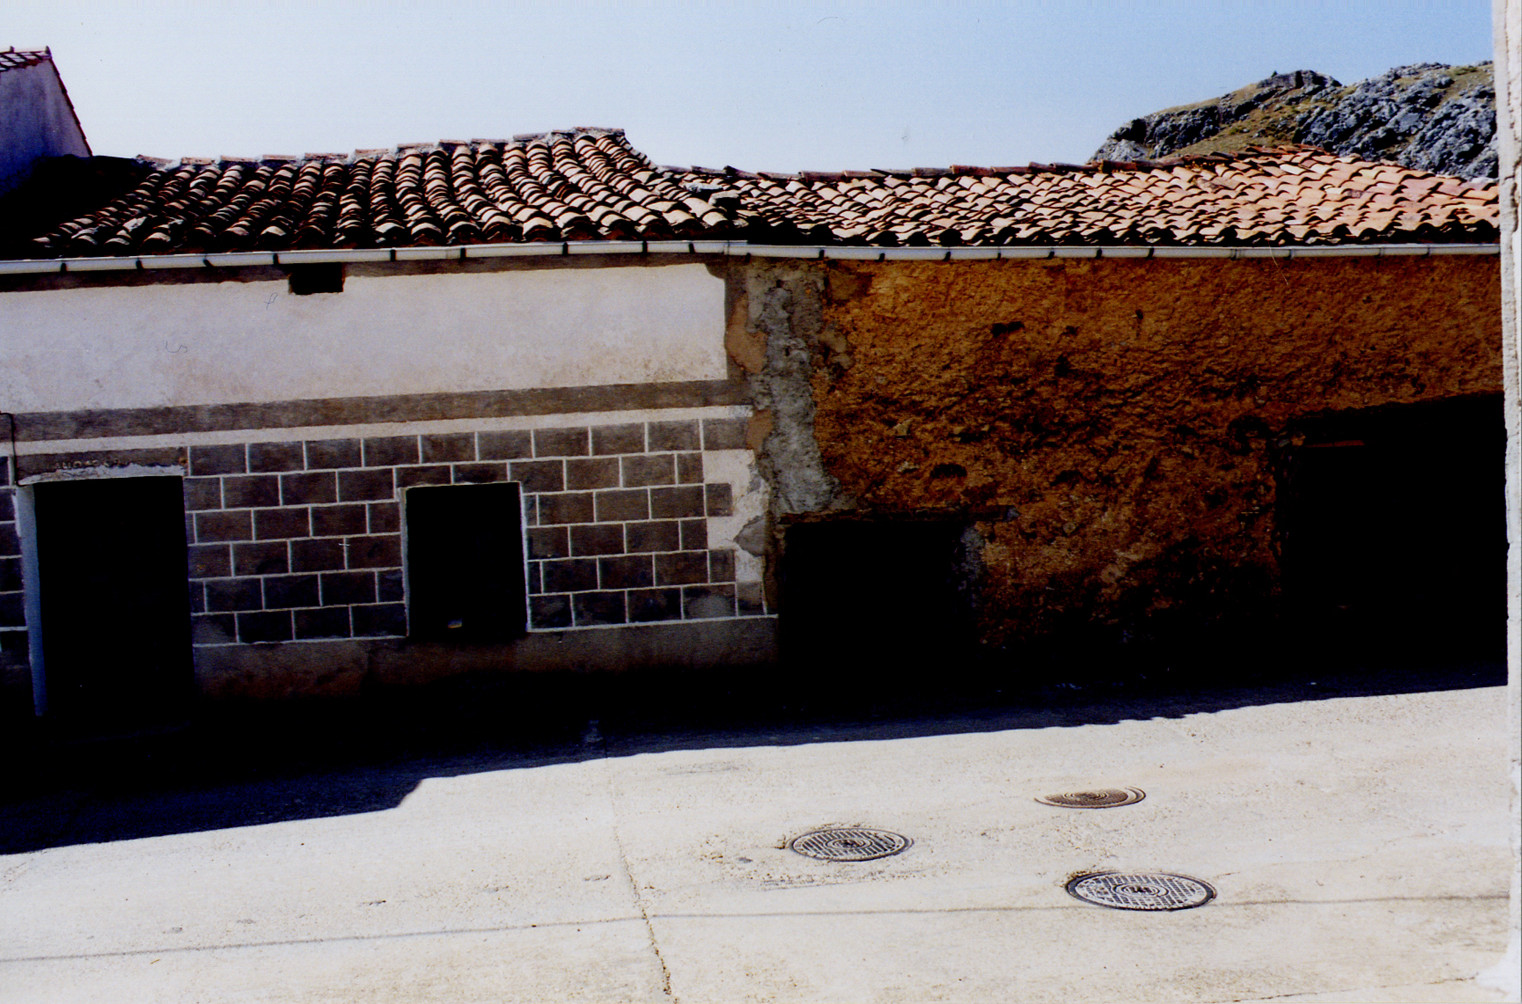 Antigua fachada de la casa rural La Chimenea de Soria